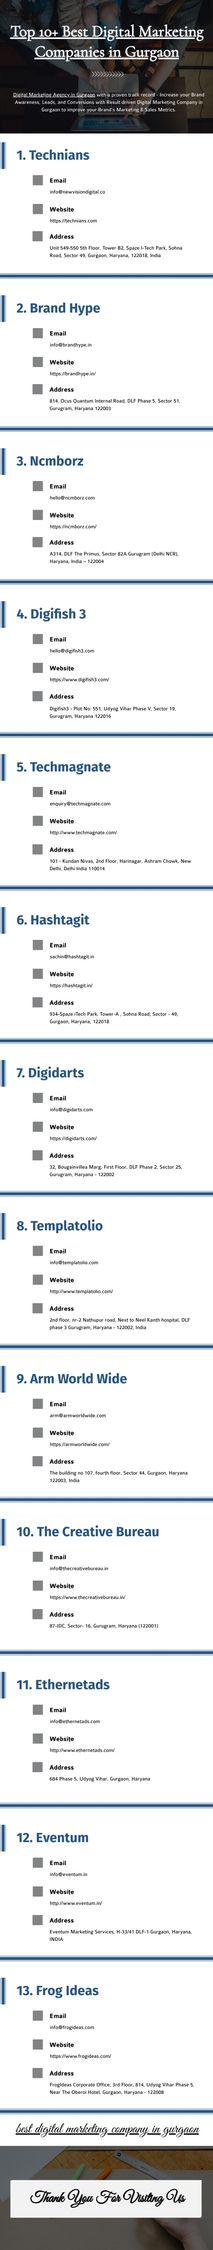 Top 10+ Digital Marketing Compa - digitalcompanygurgaon | ello